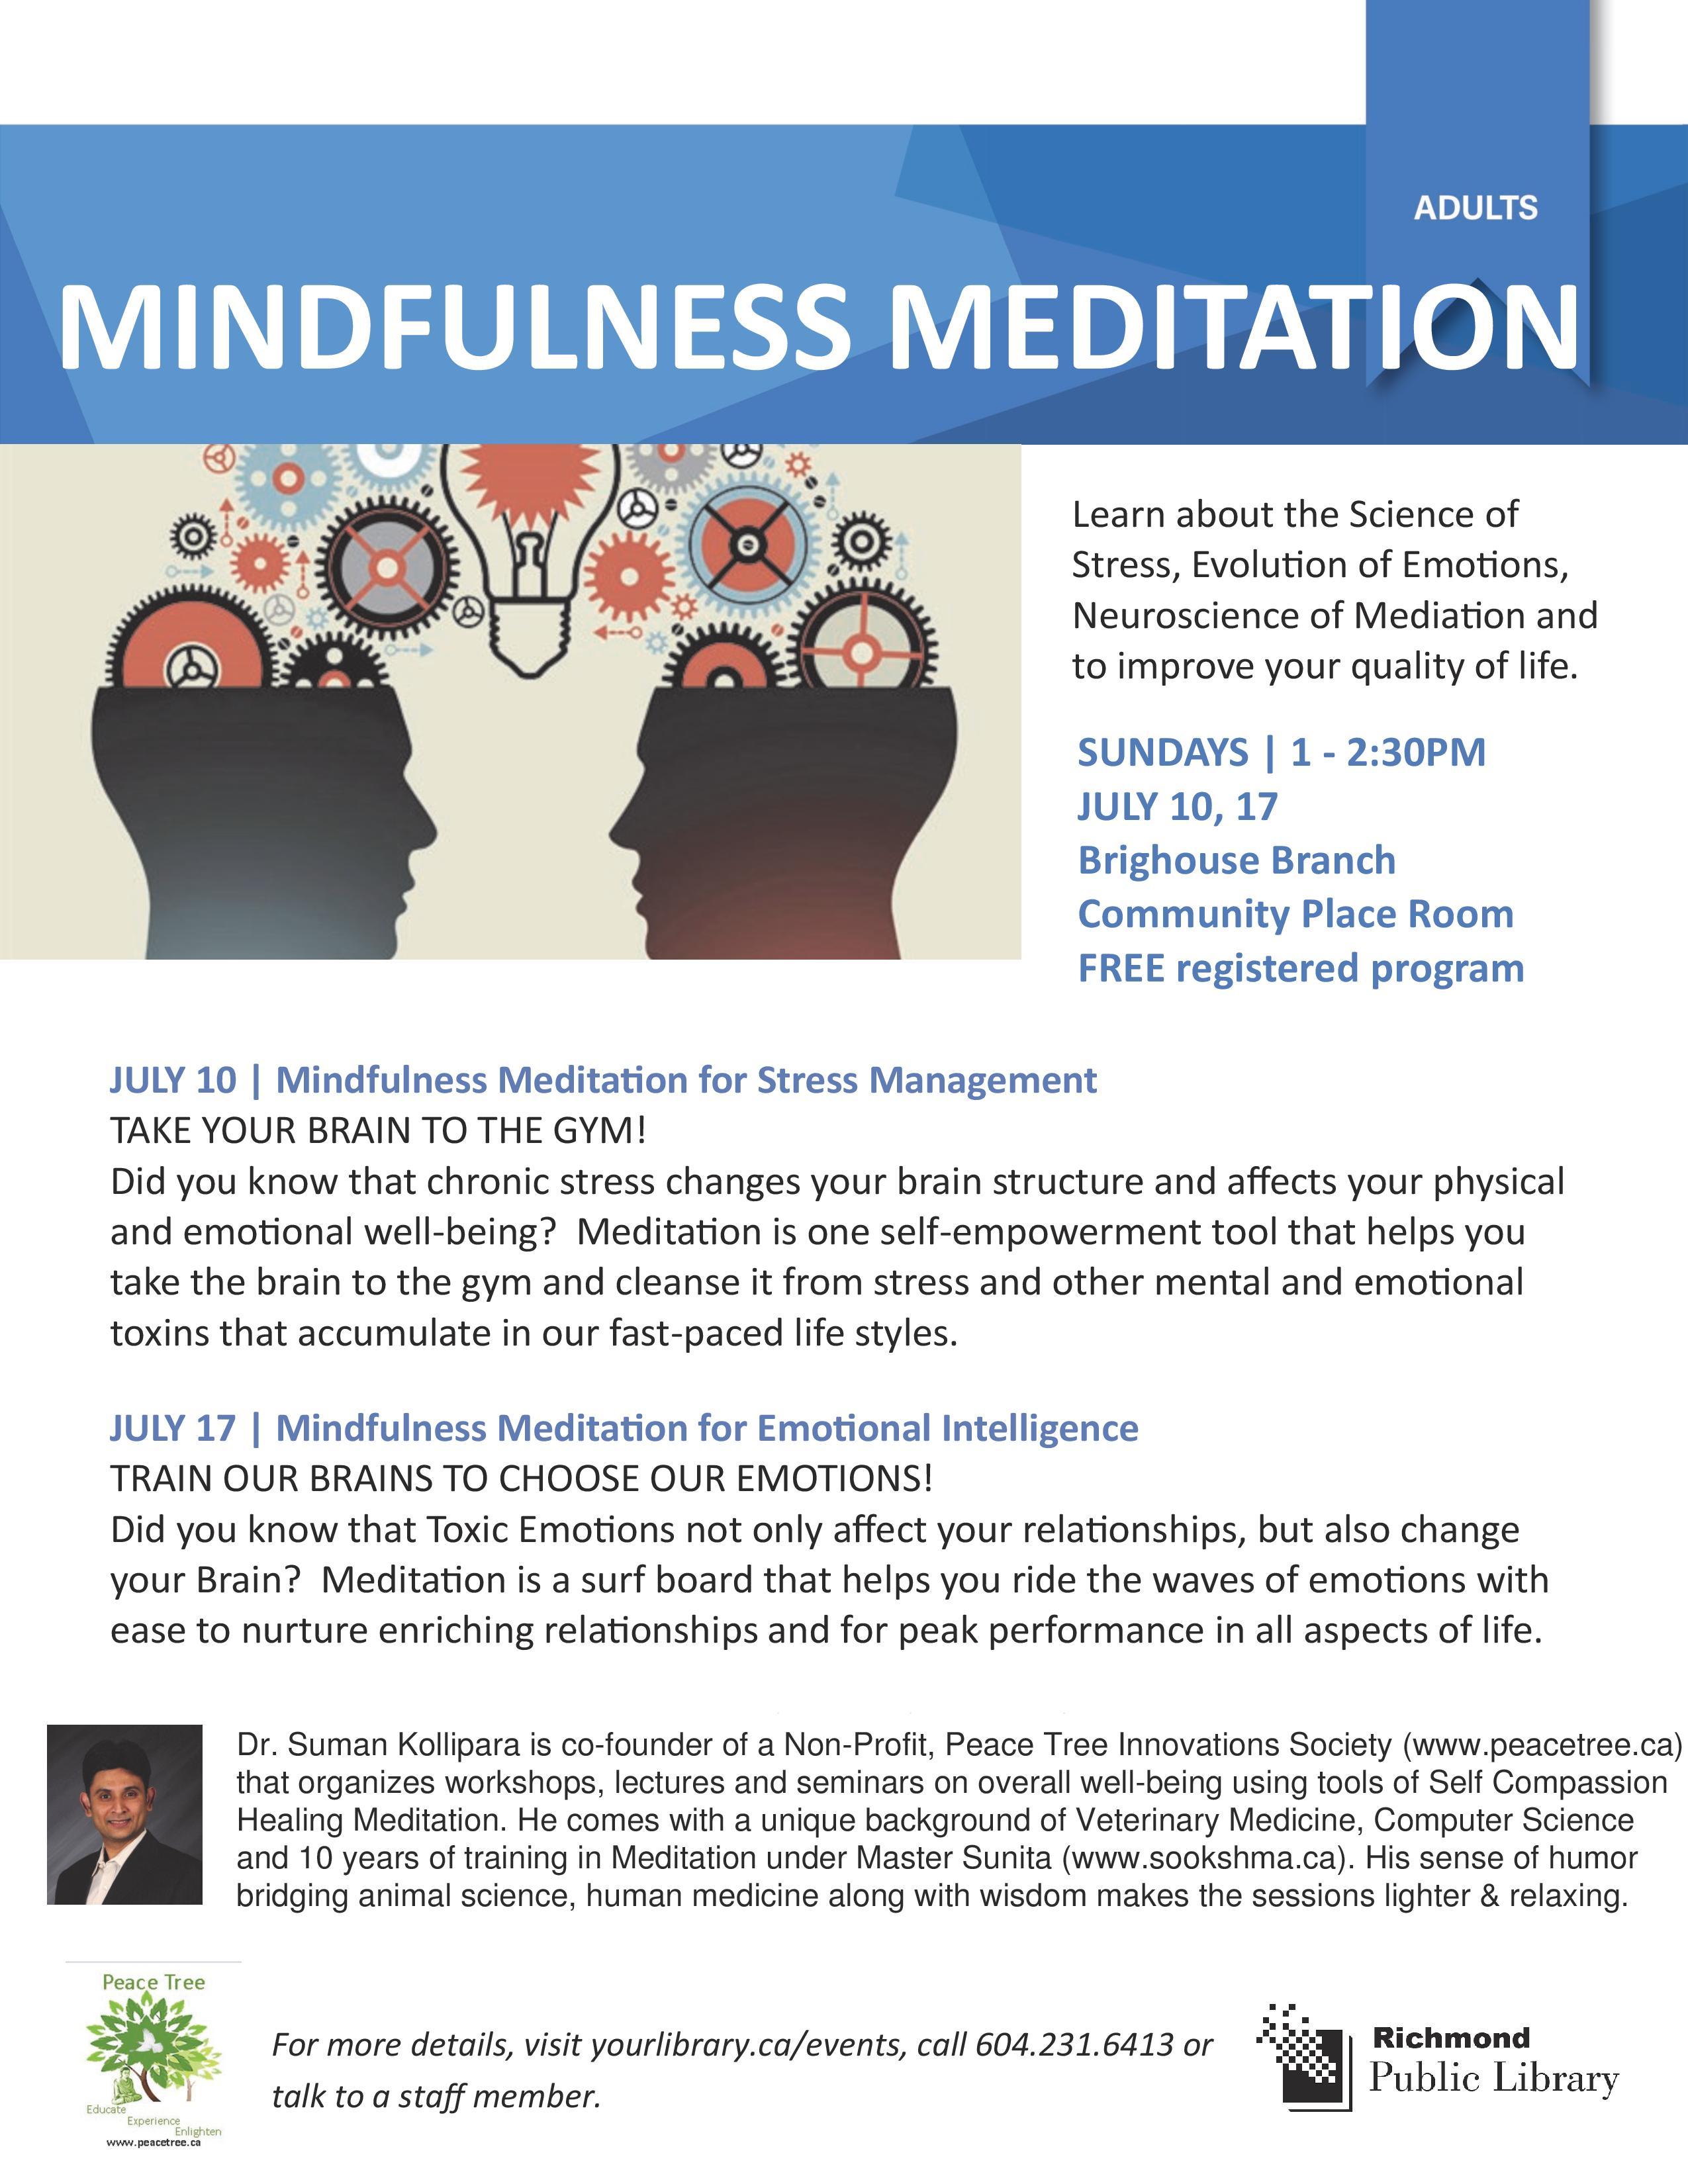 Mindfulness_Meditation_Richmond_Public_Library_July 10-17-page-001